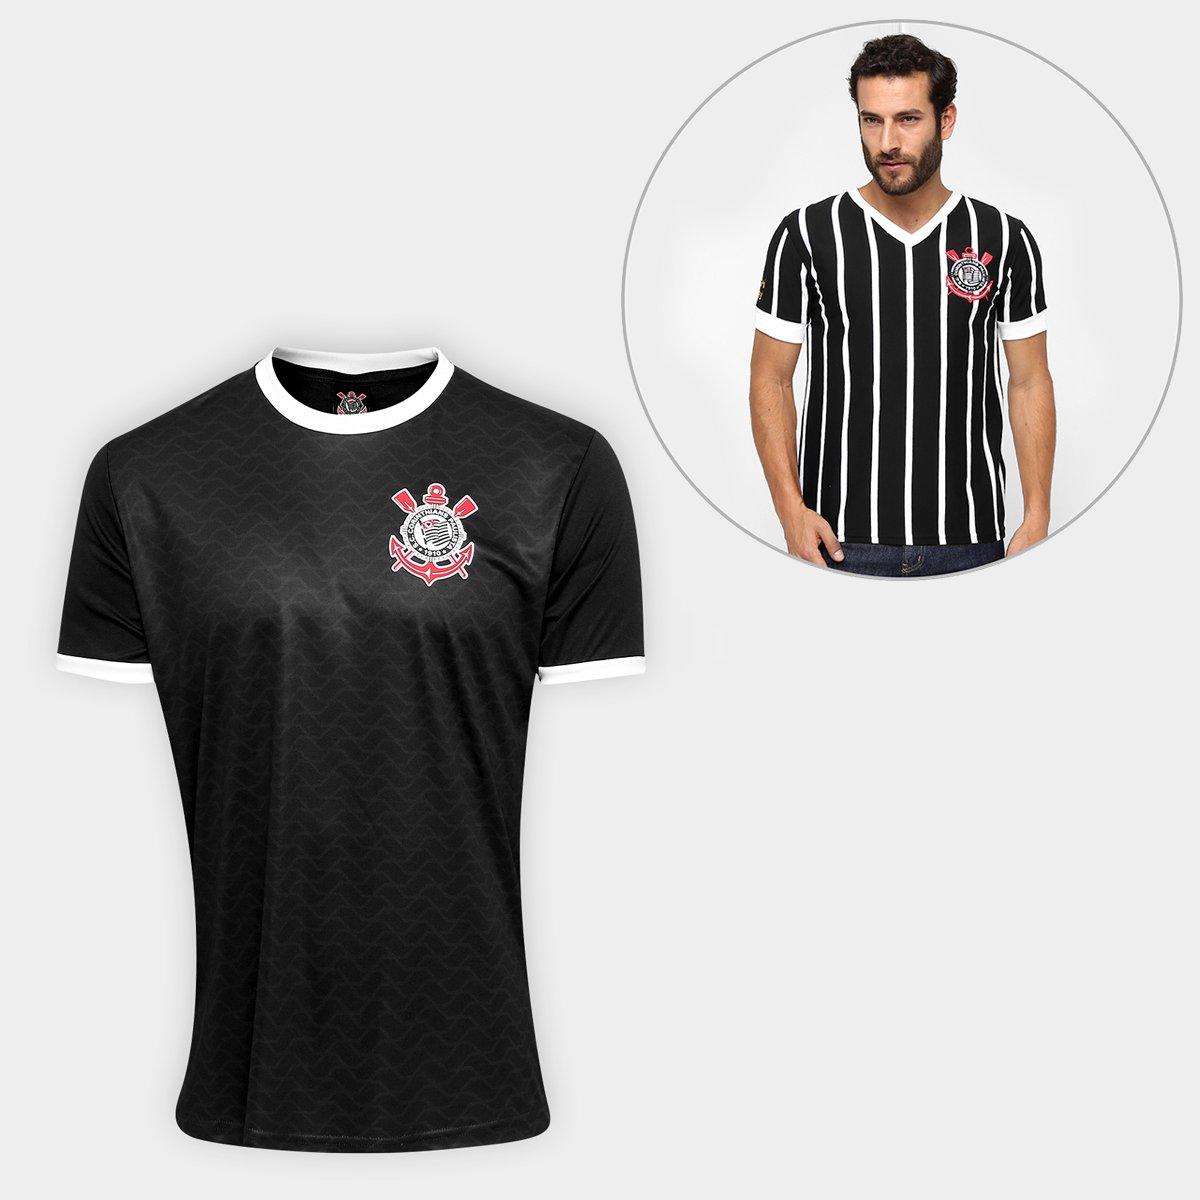 Kit Camisa Corinthians Libertados + Camiseta Corinthians Réplica 1983 ... aea00ec353ea2